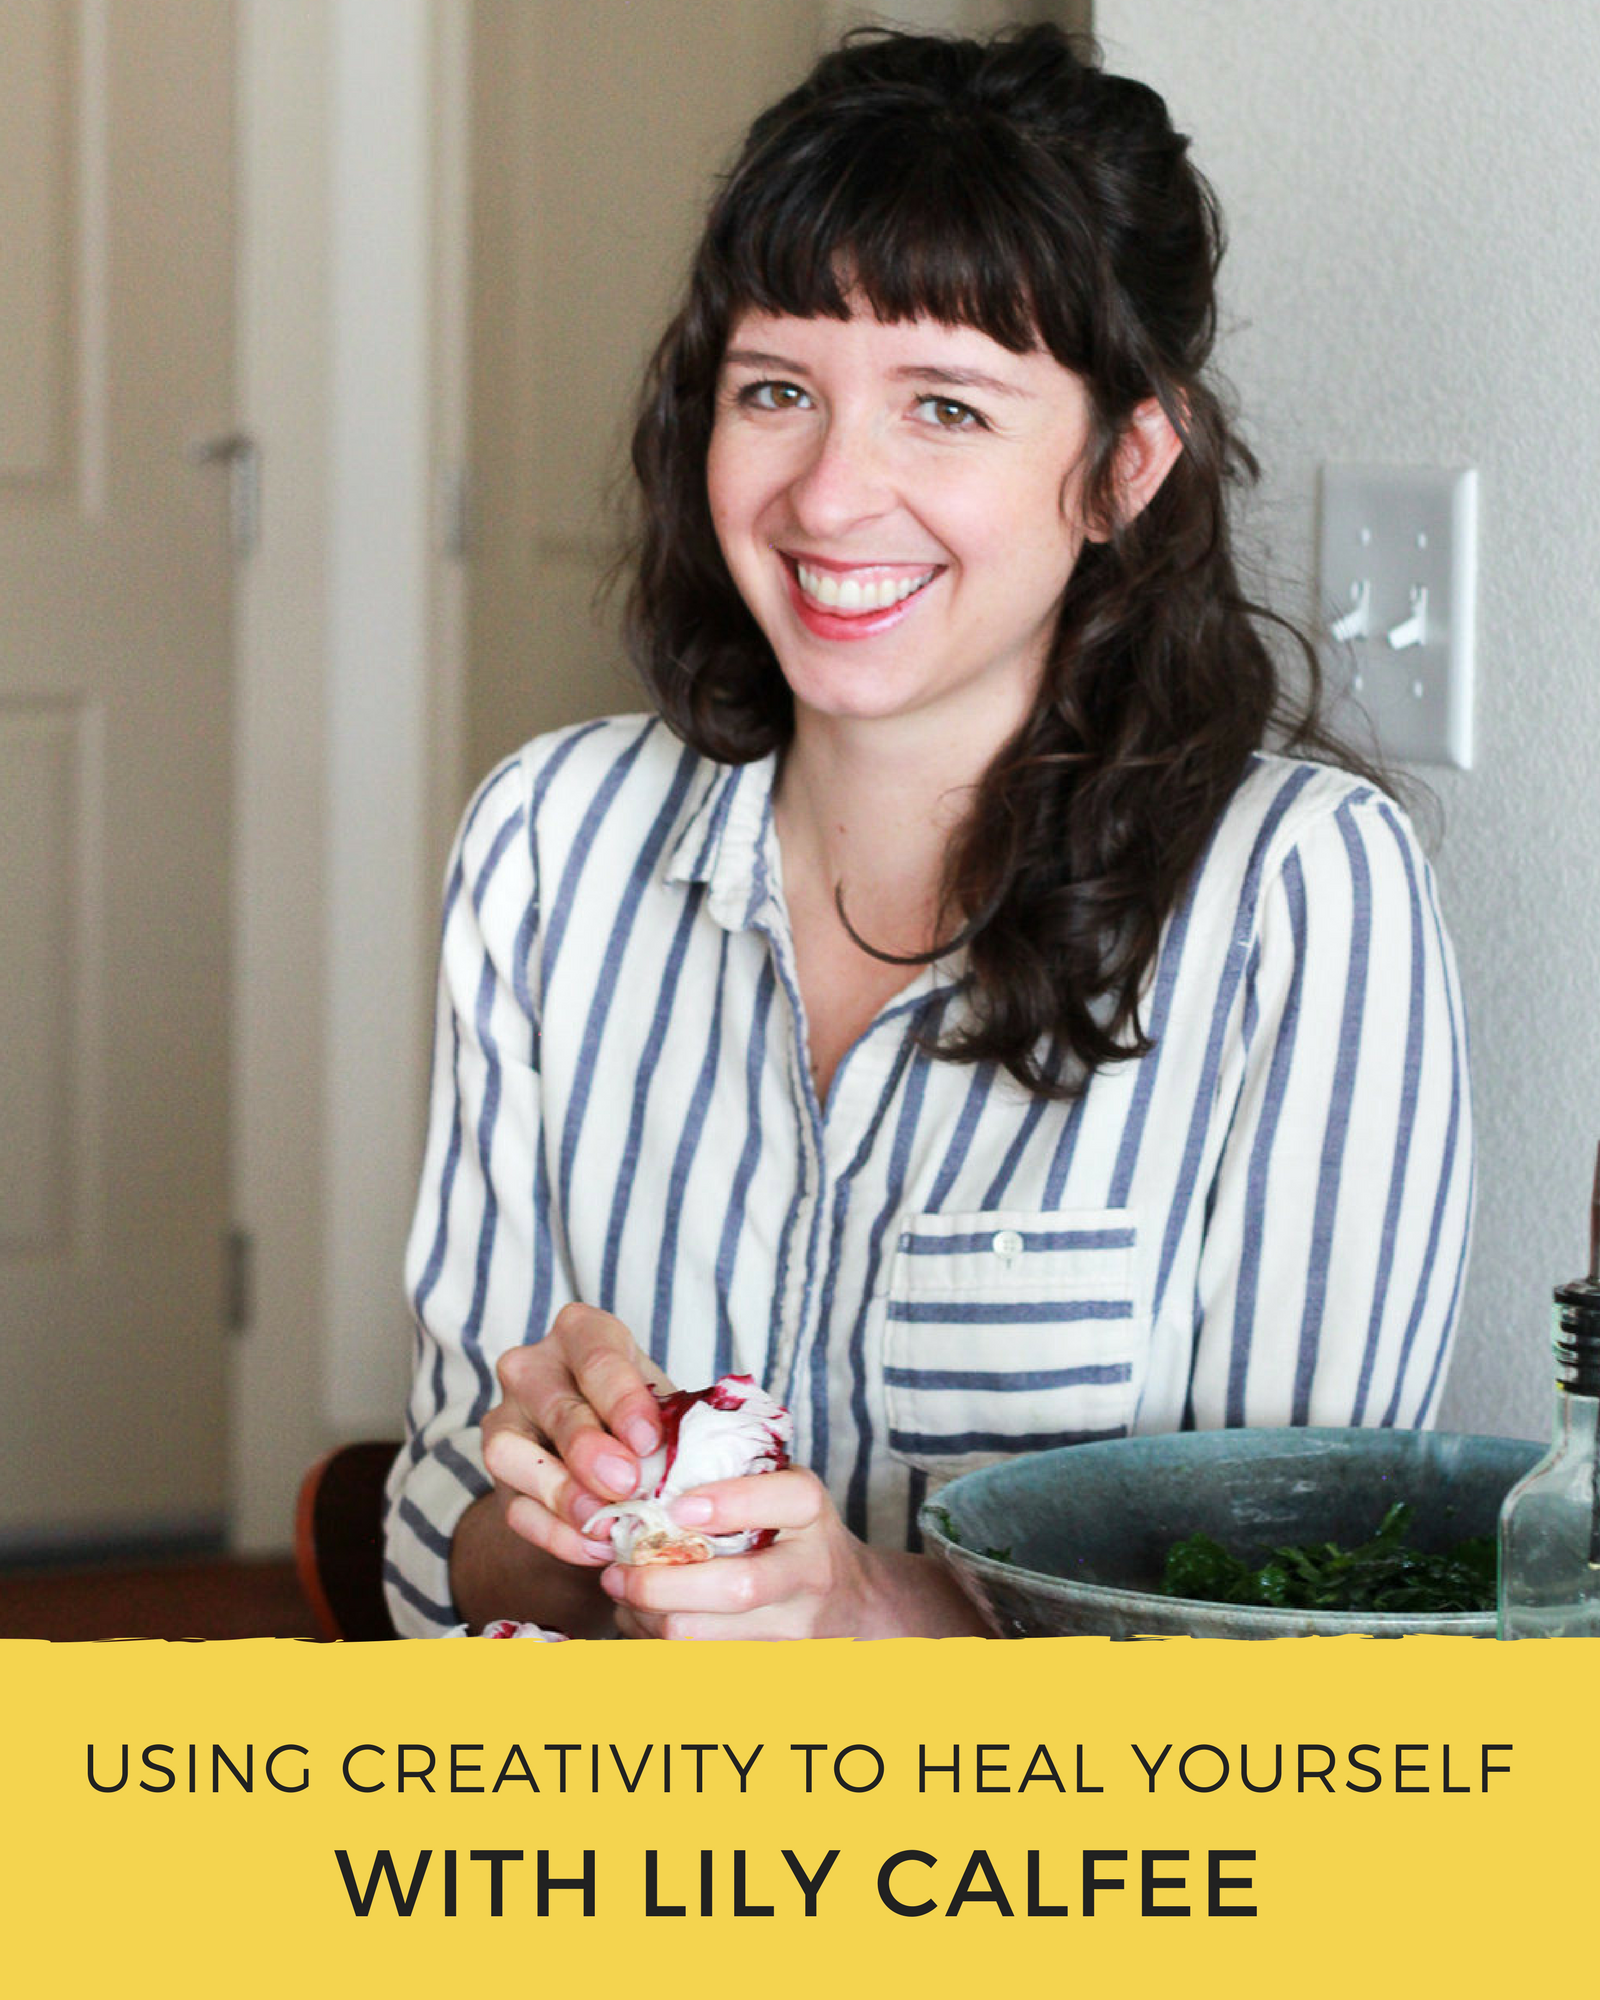 Use Creativity to Heal Your Trauma